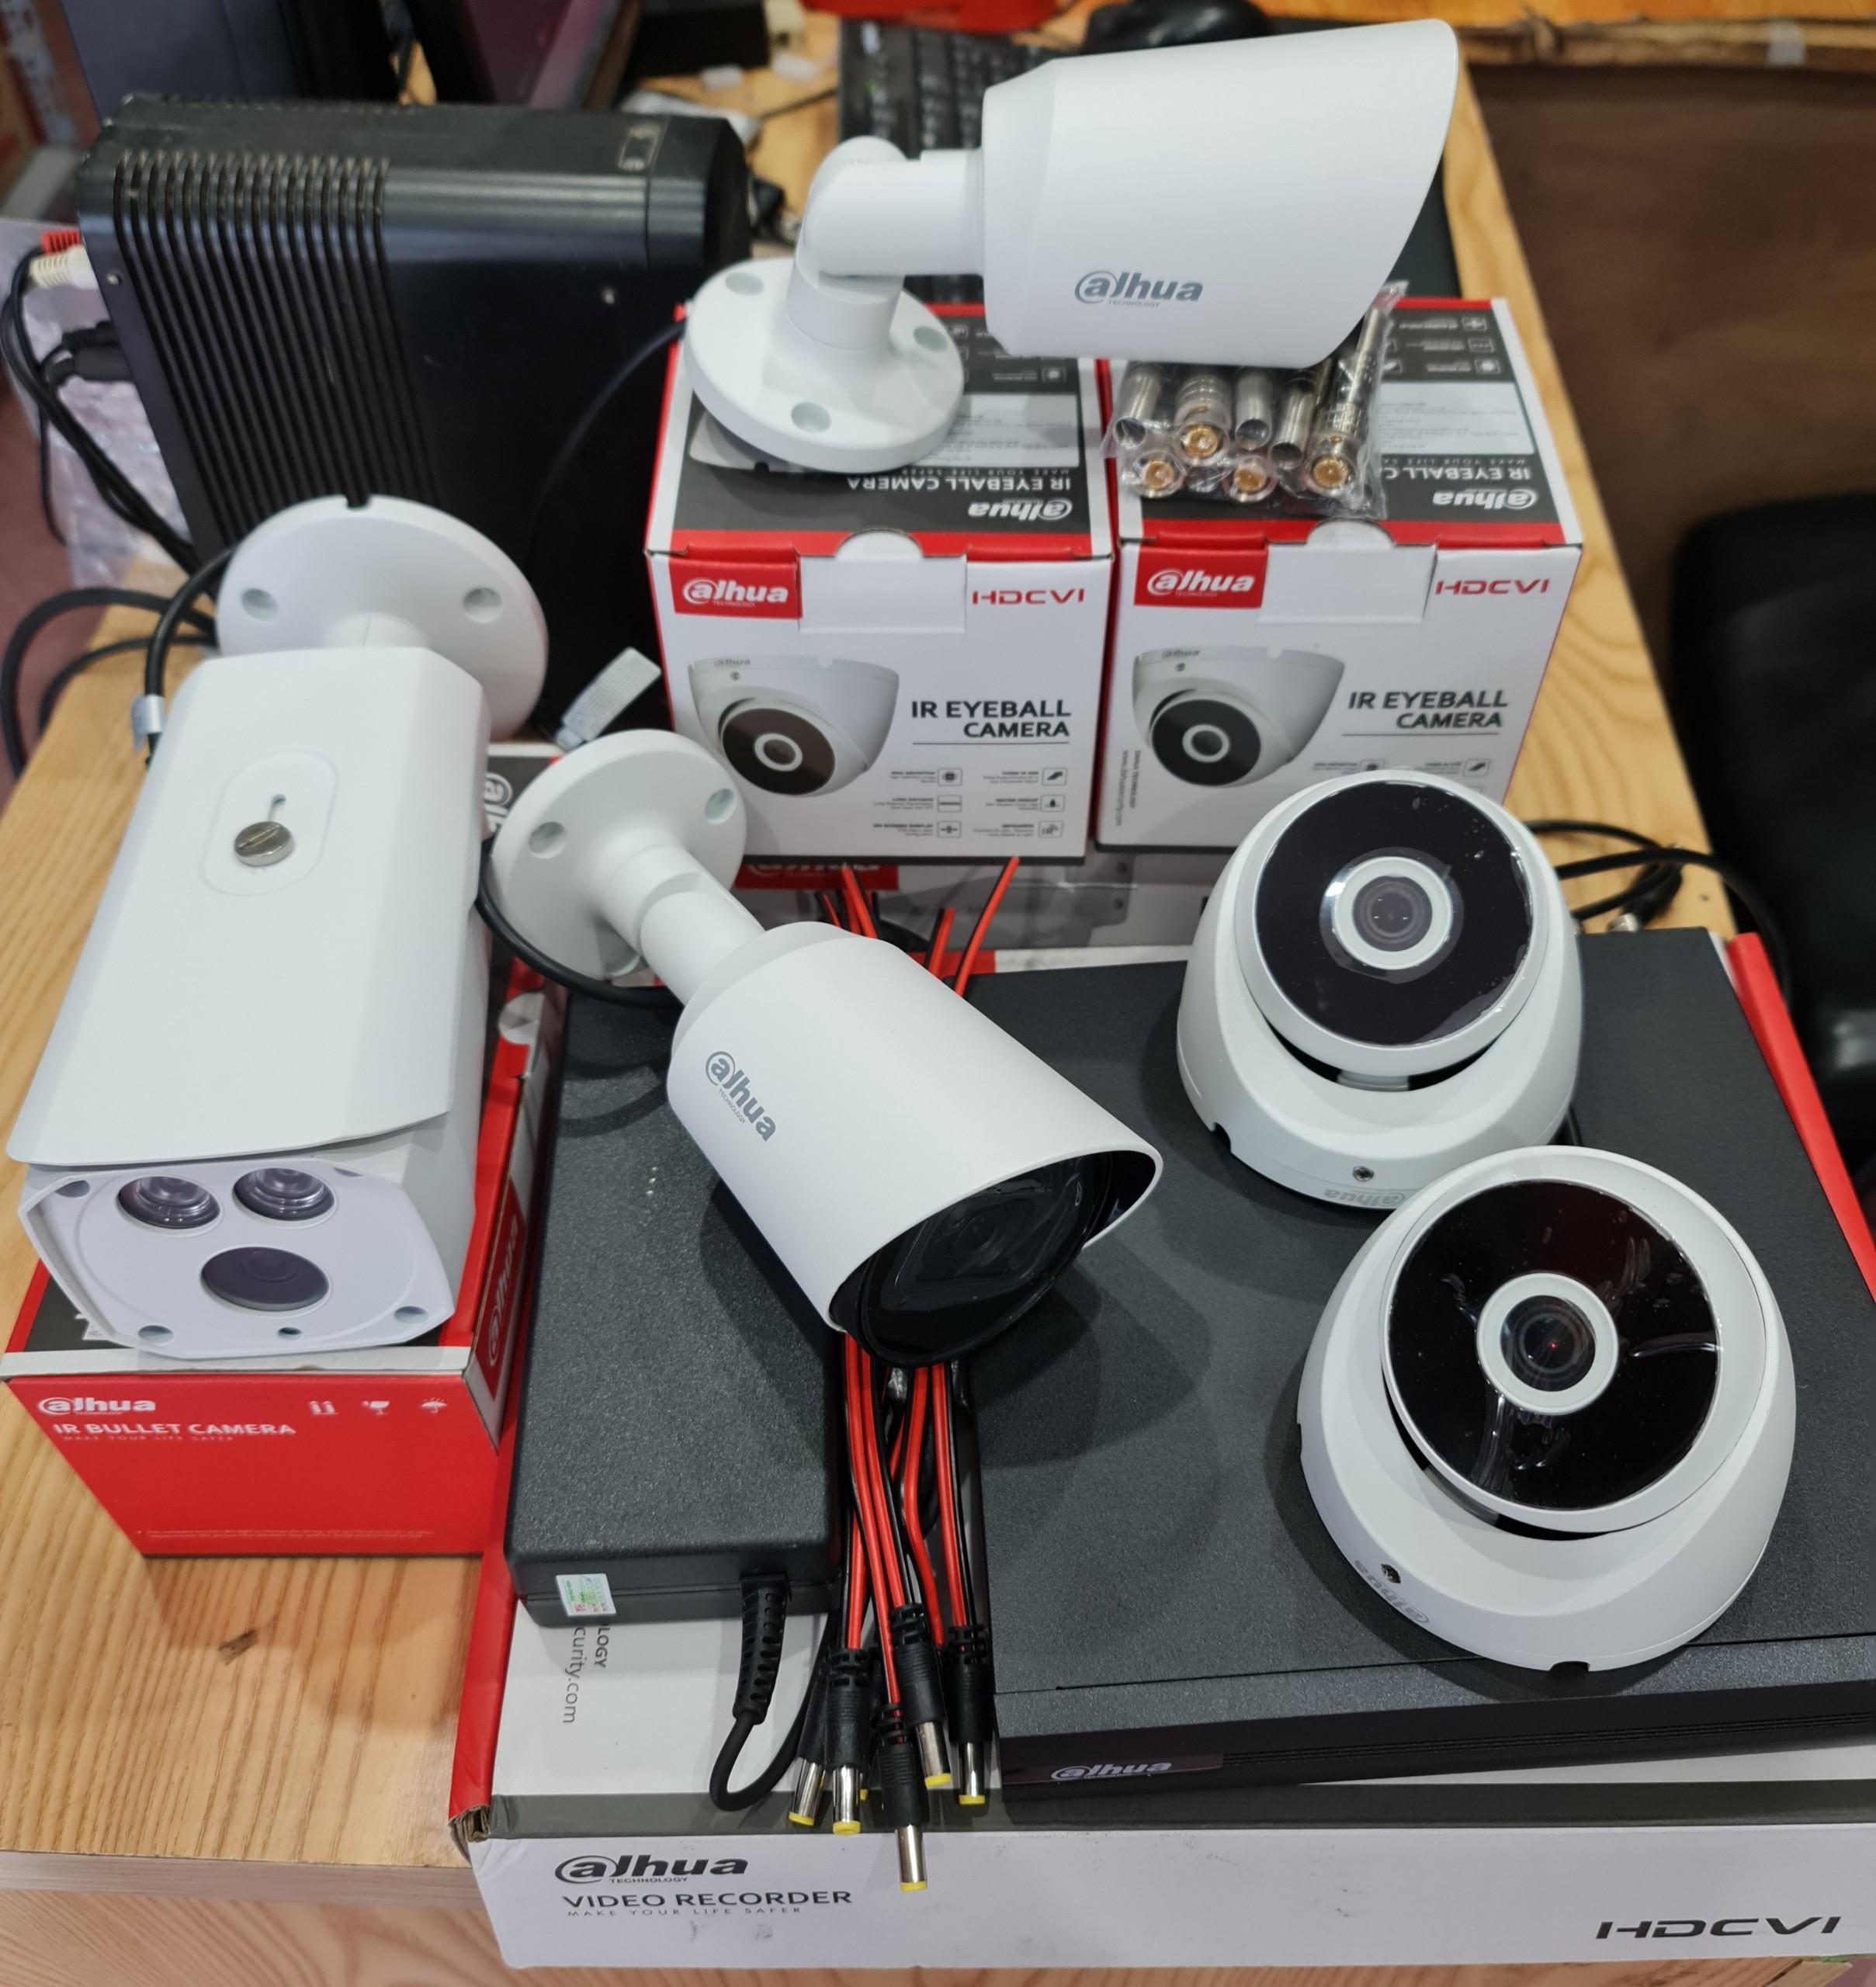 Lắp đặt trọn bộ 6 camera 1080P